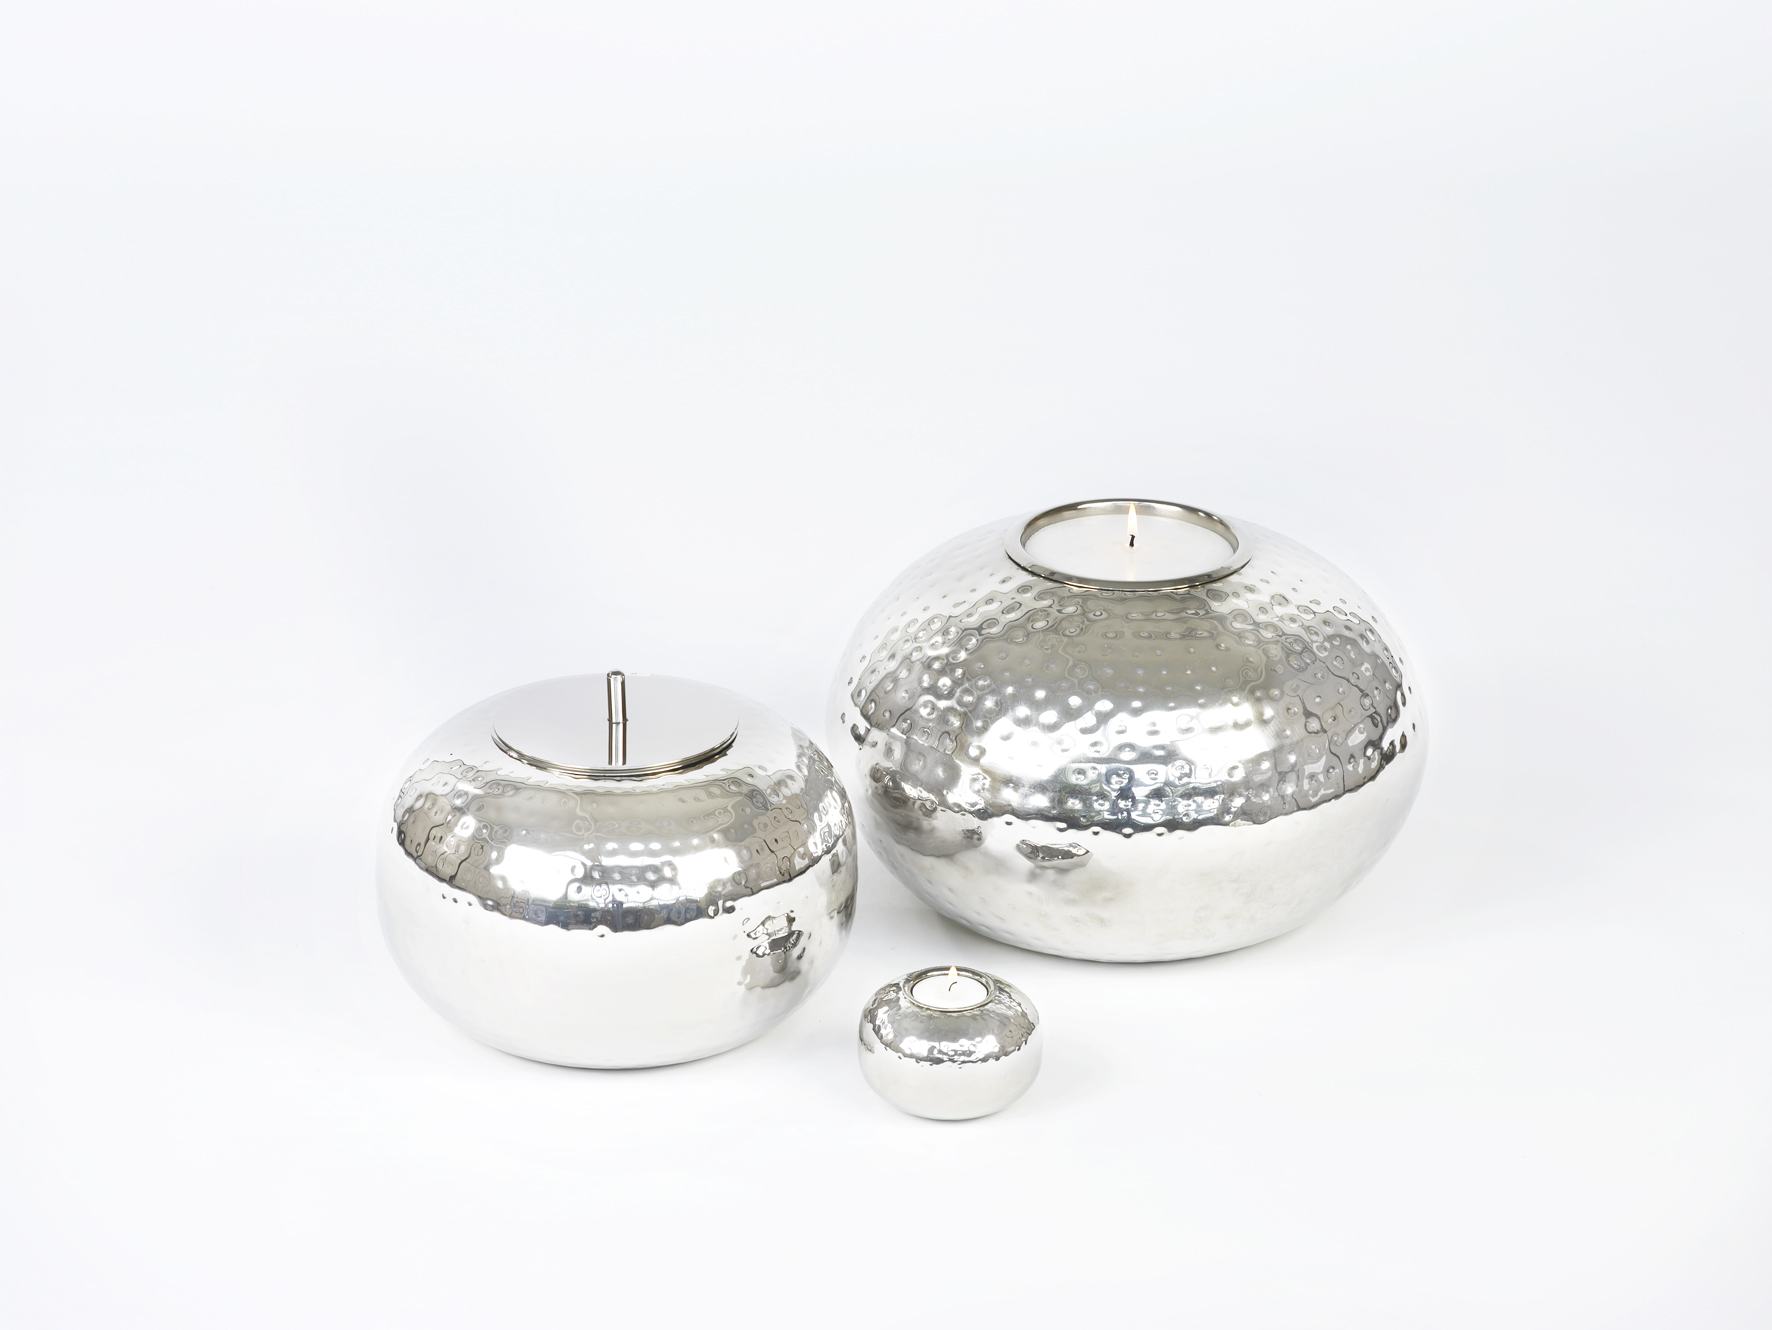 lambert marakesh vase dose mit kerze lambert. Black Bedroom Furniture Sets. Home Design Ideas